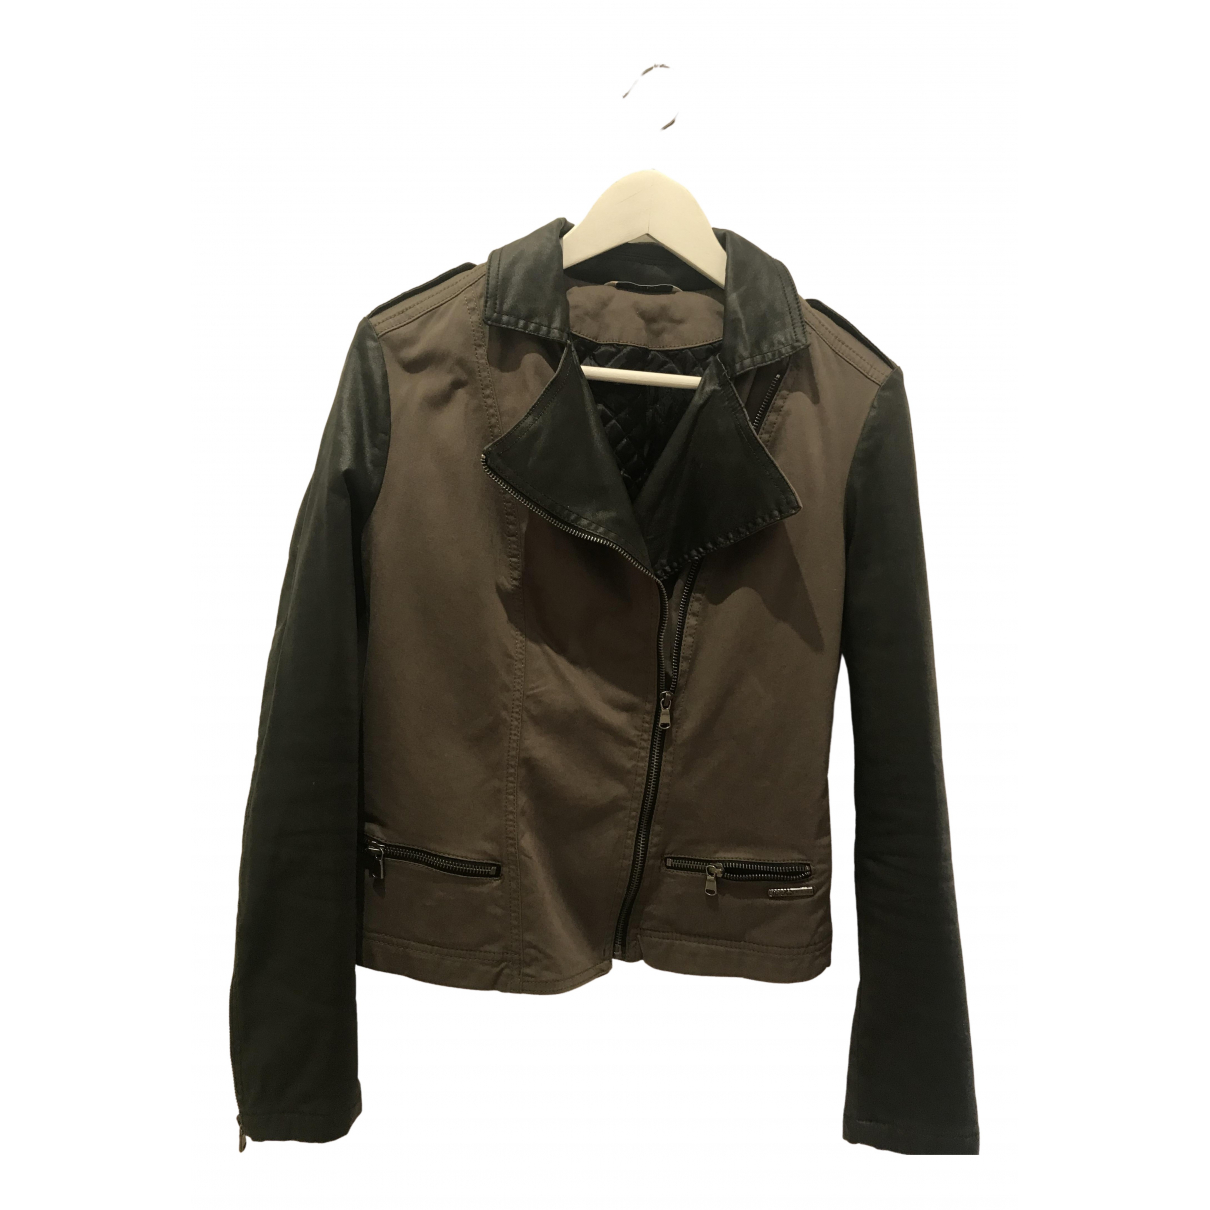 Liu.jo \N Khaki Cotton jacket for Women 36 FR